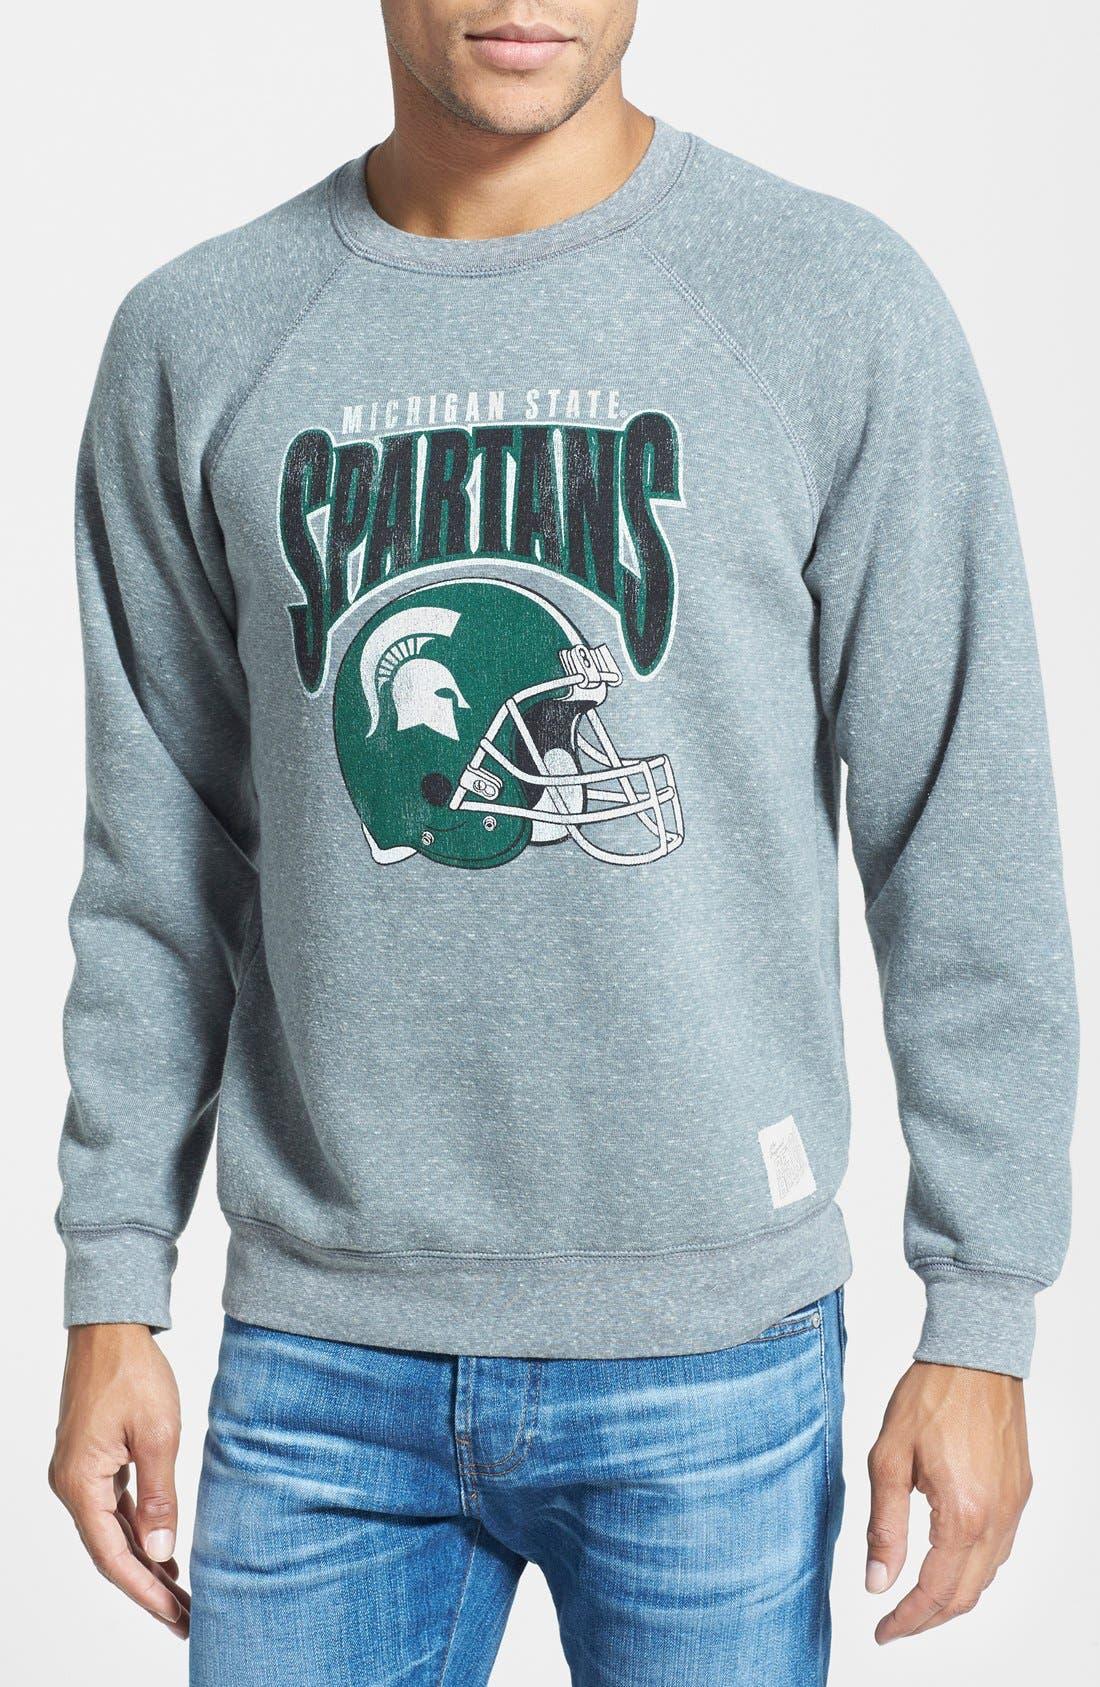 Alternate Image 1 Selected - Retro Brand 'Michigan State Spartans Football' Slim Fit Raglan Crewneck Sweatshirt